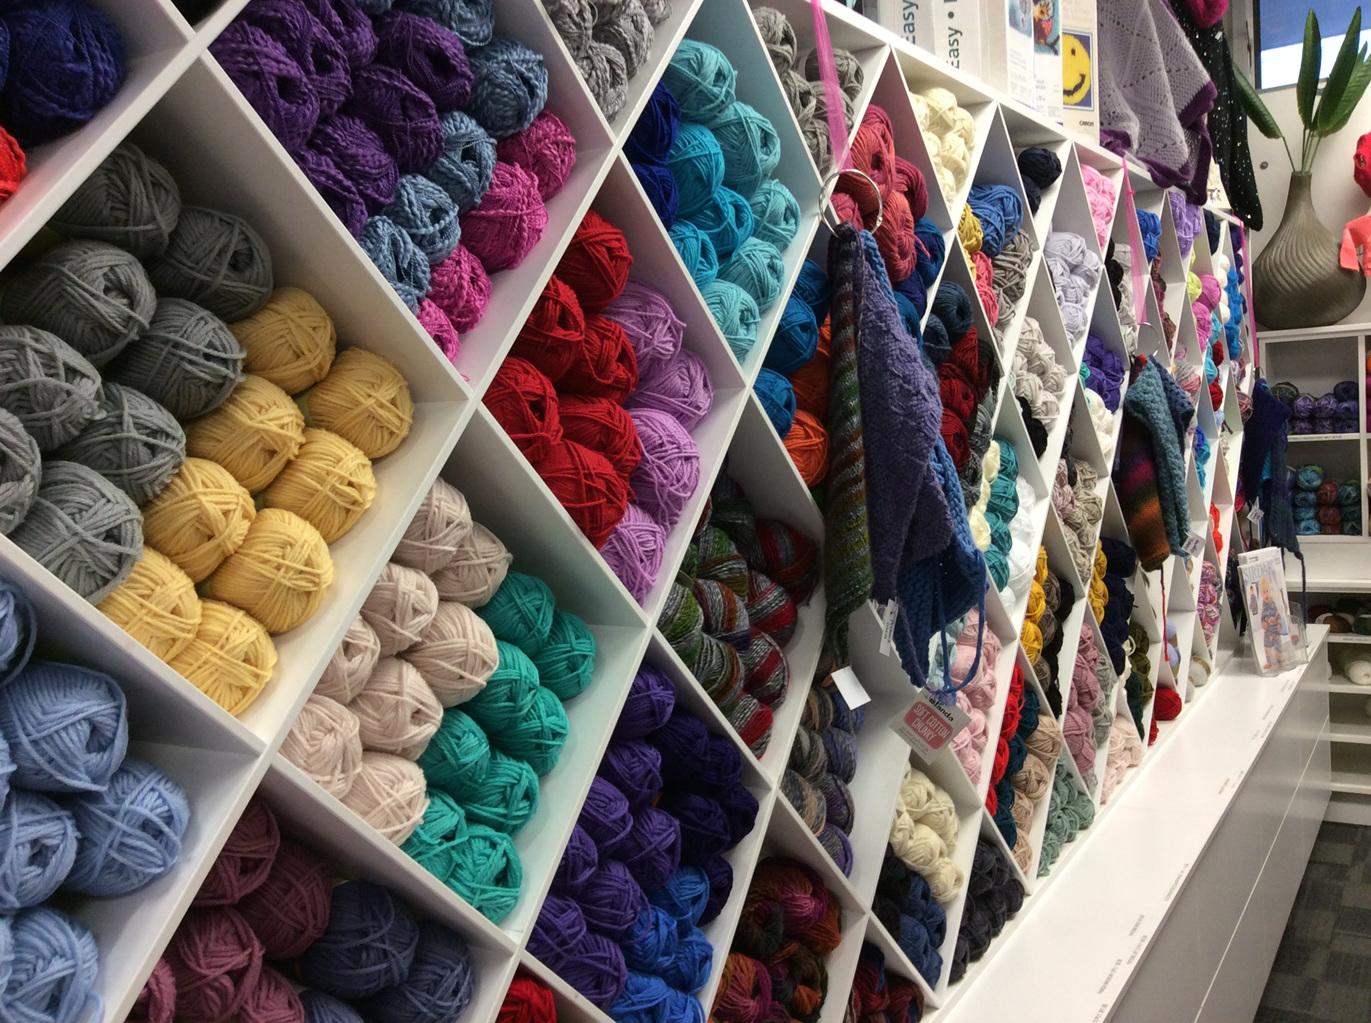 Yarn - Merino, Wool, Alpaca